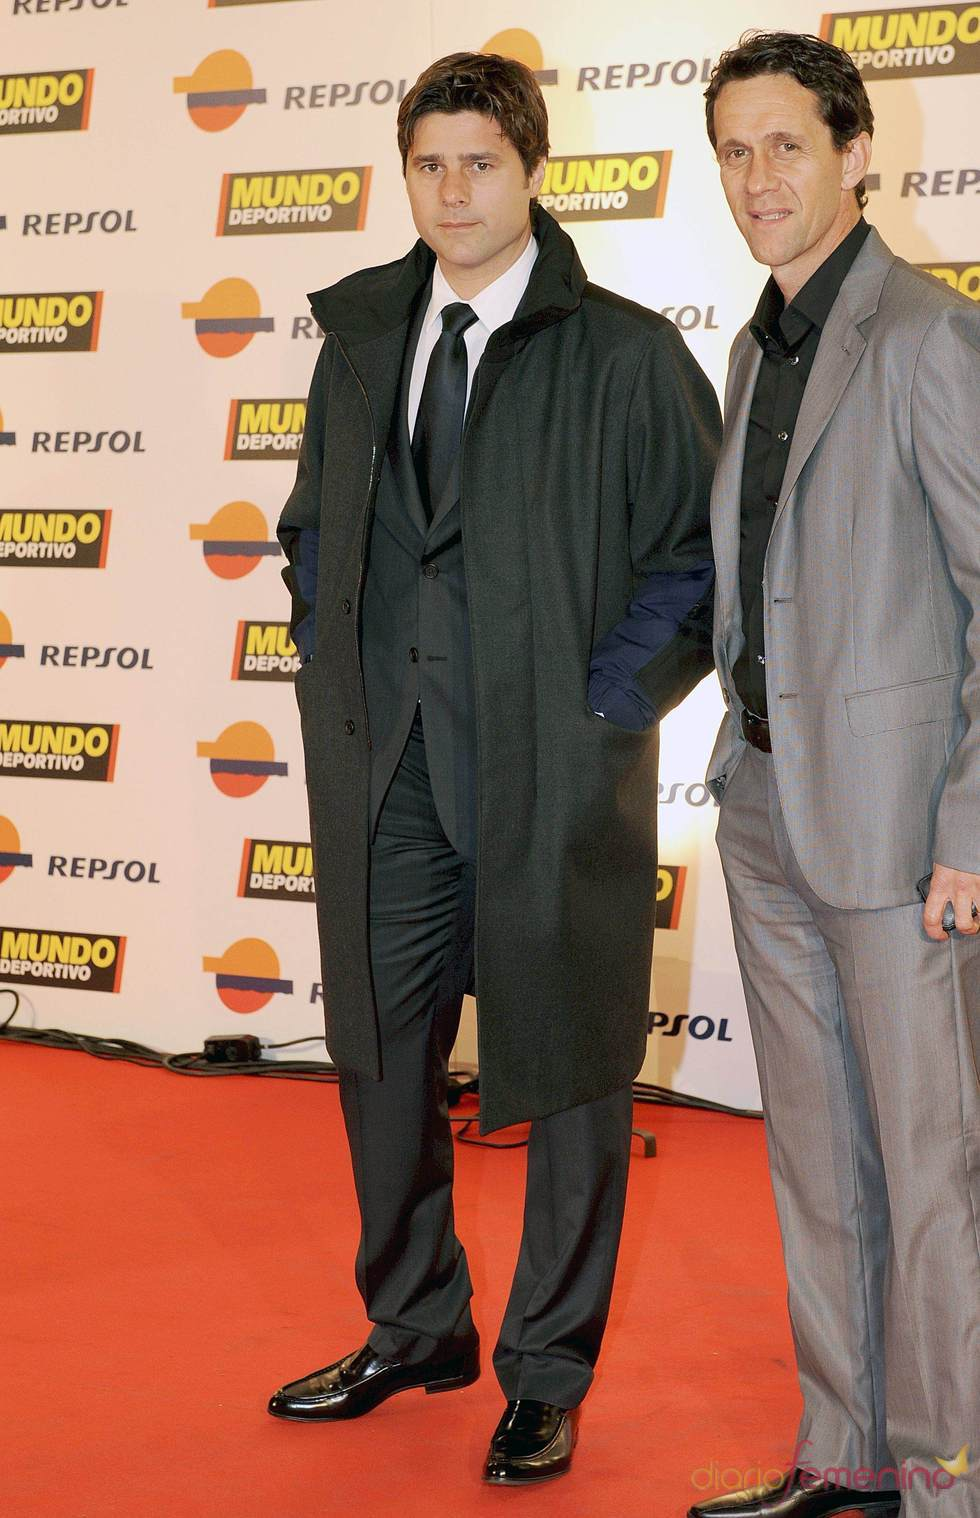 Mauricio Pochettino en la gala 'Mundo Deportivo' 2011